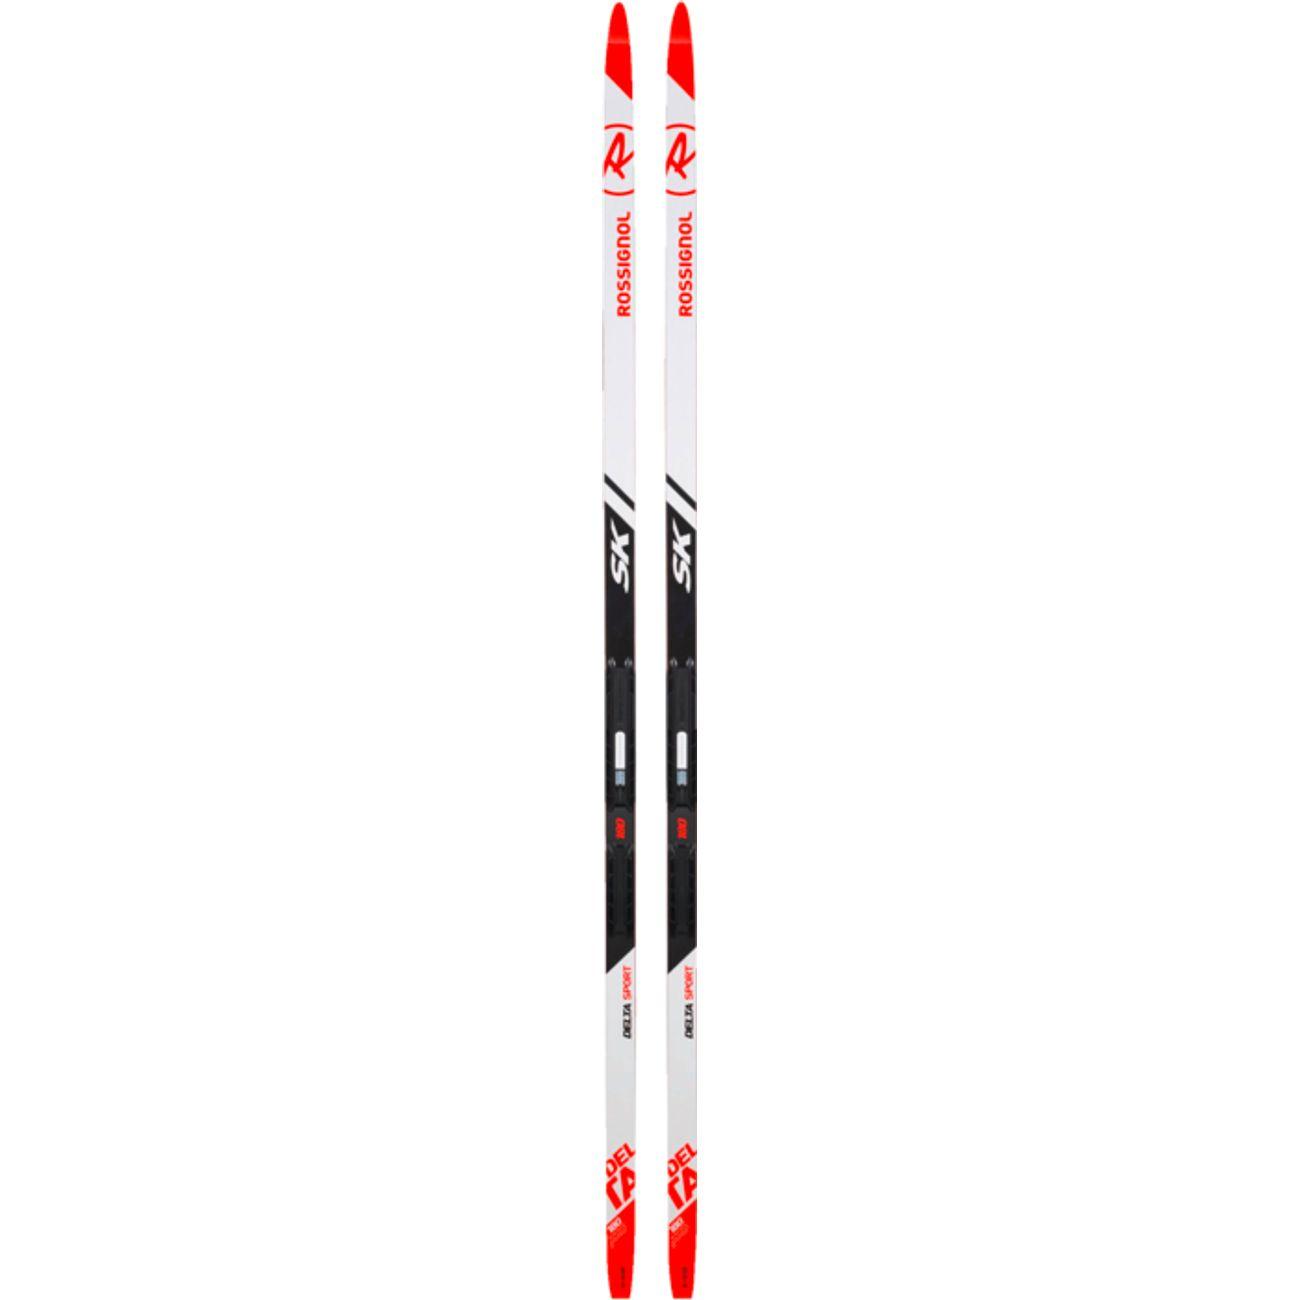 SKIS Ski adulte ROSSIGNOL DELTA SPORT SKATING -IFP - RACE SKA